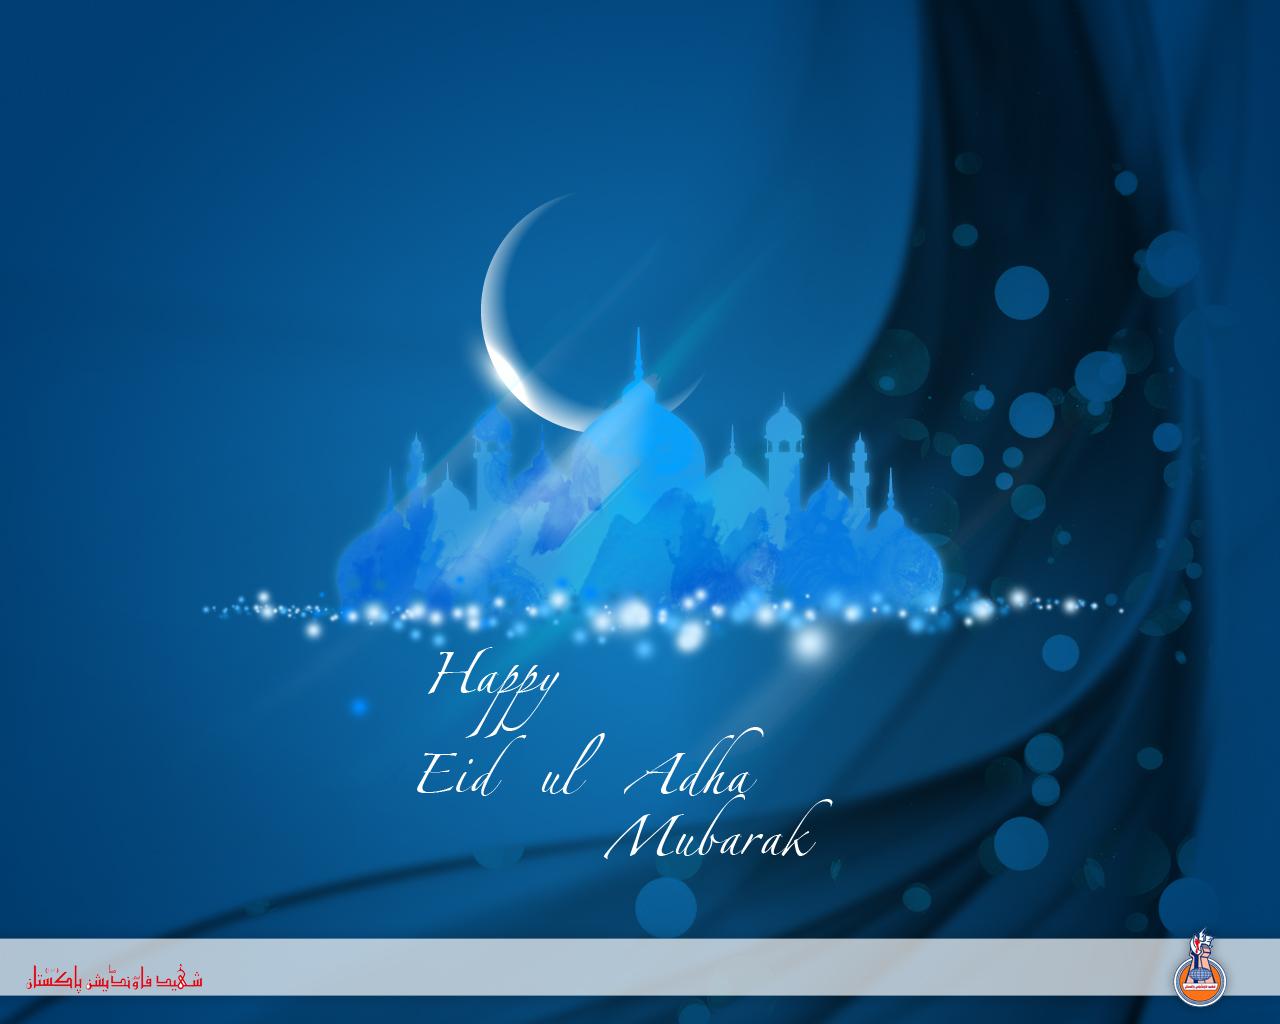 Eid-ul-Azha 1433 A.H